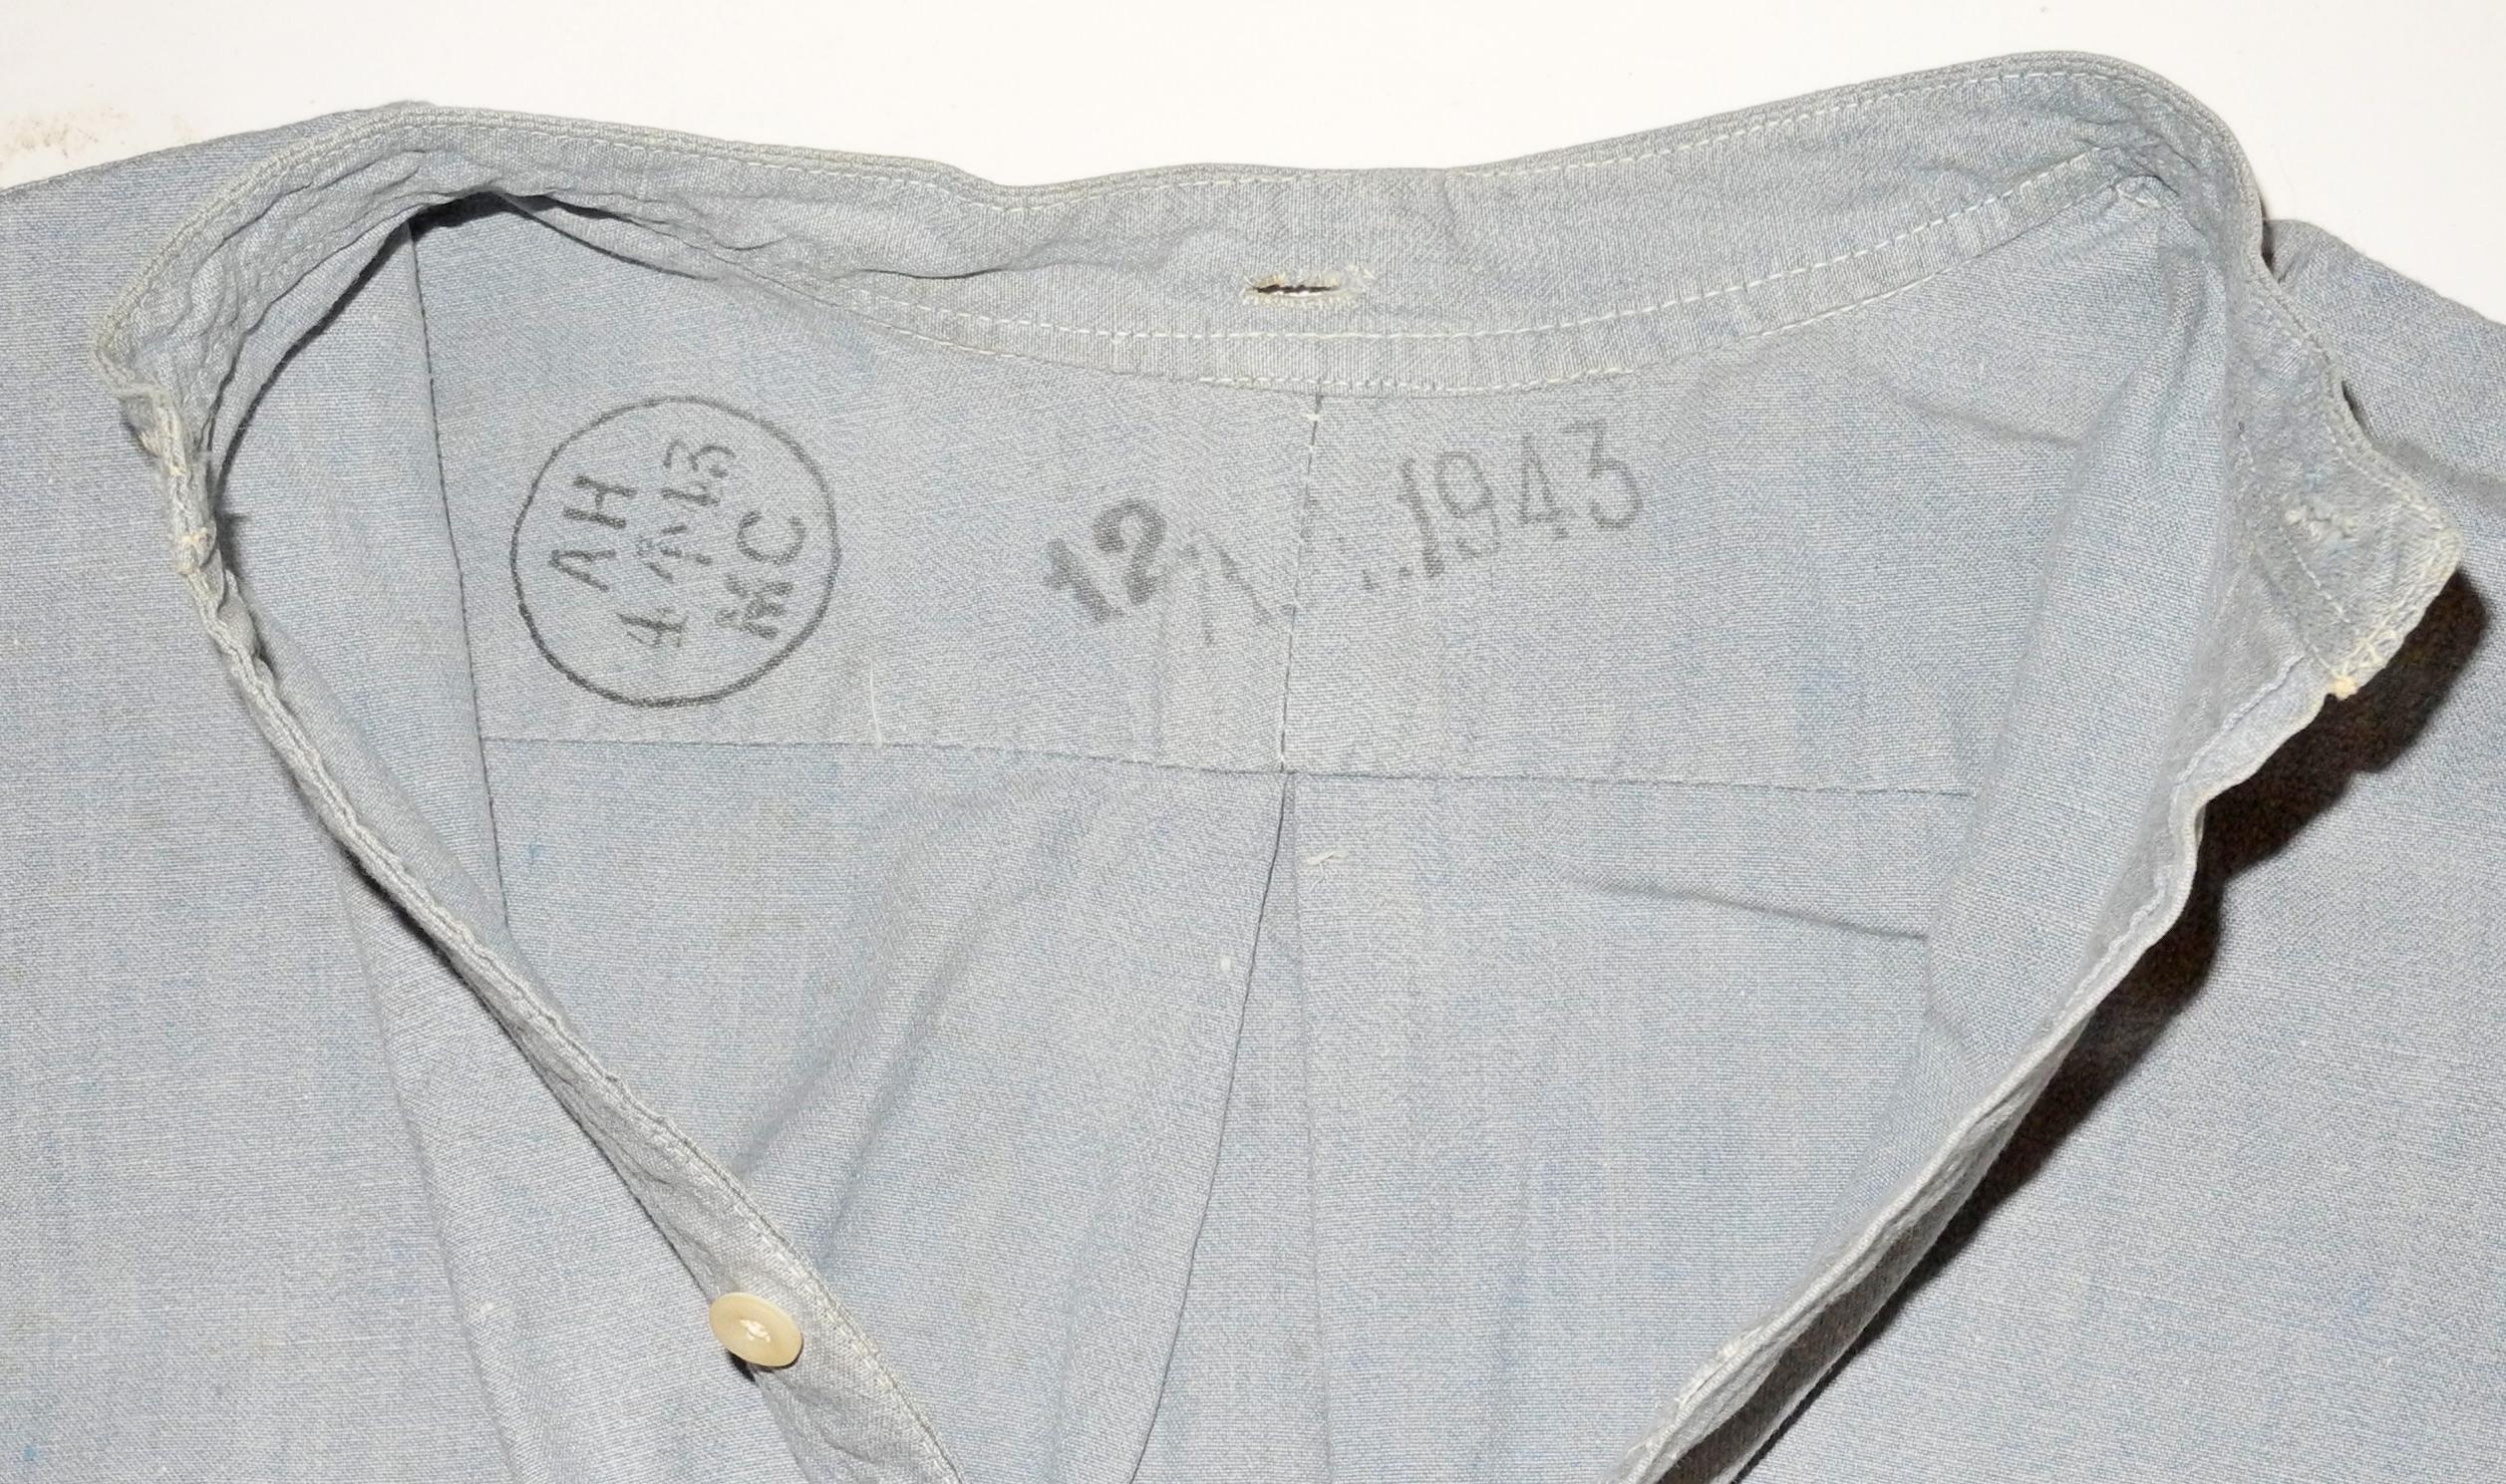 RAF collarless shirt dated 1943